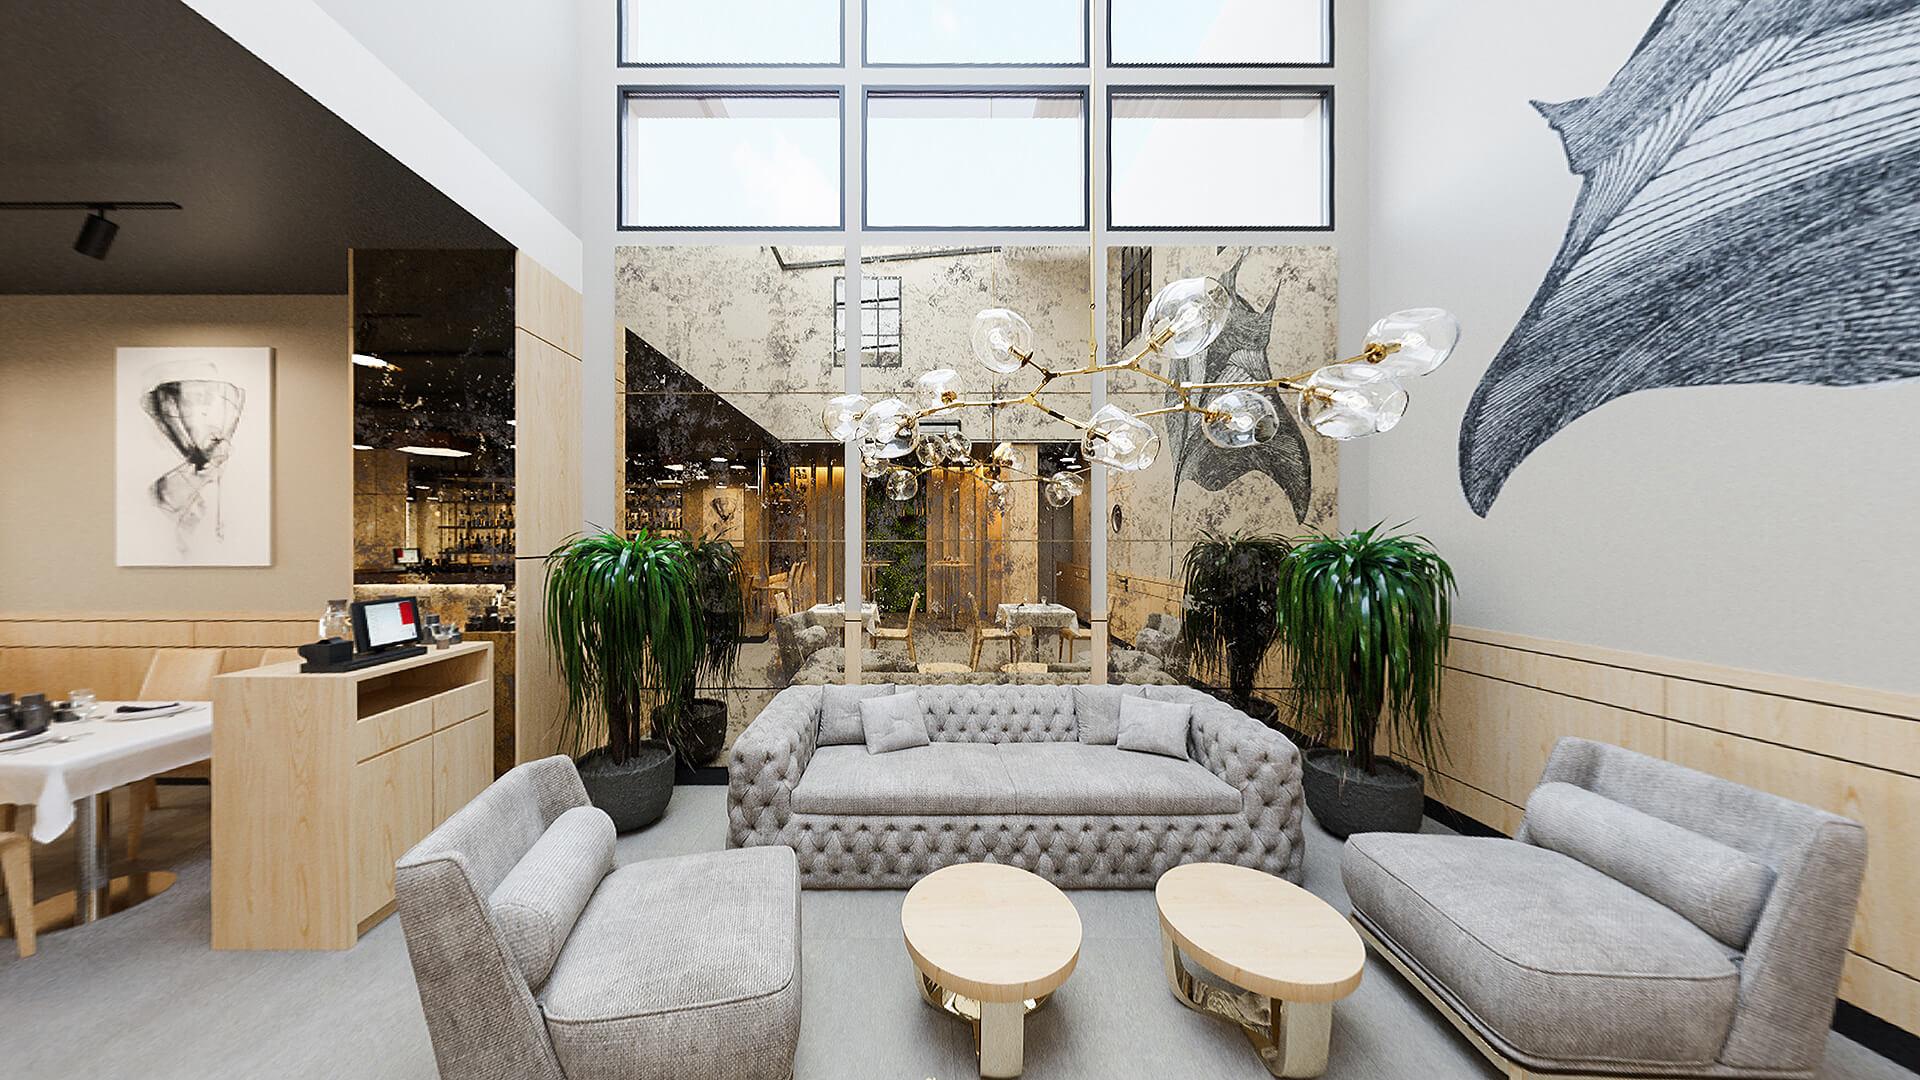 moya-restaurant-interior-design-2.jpg